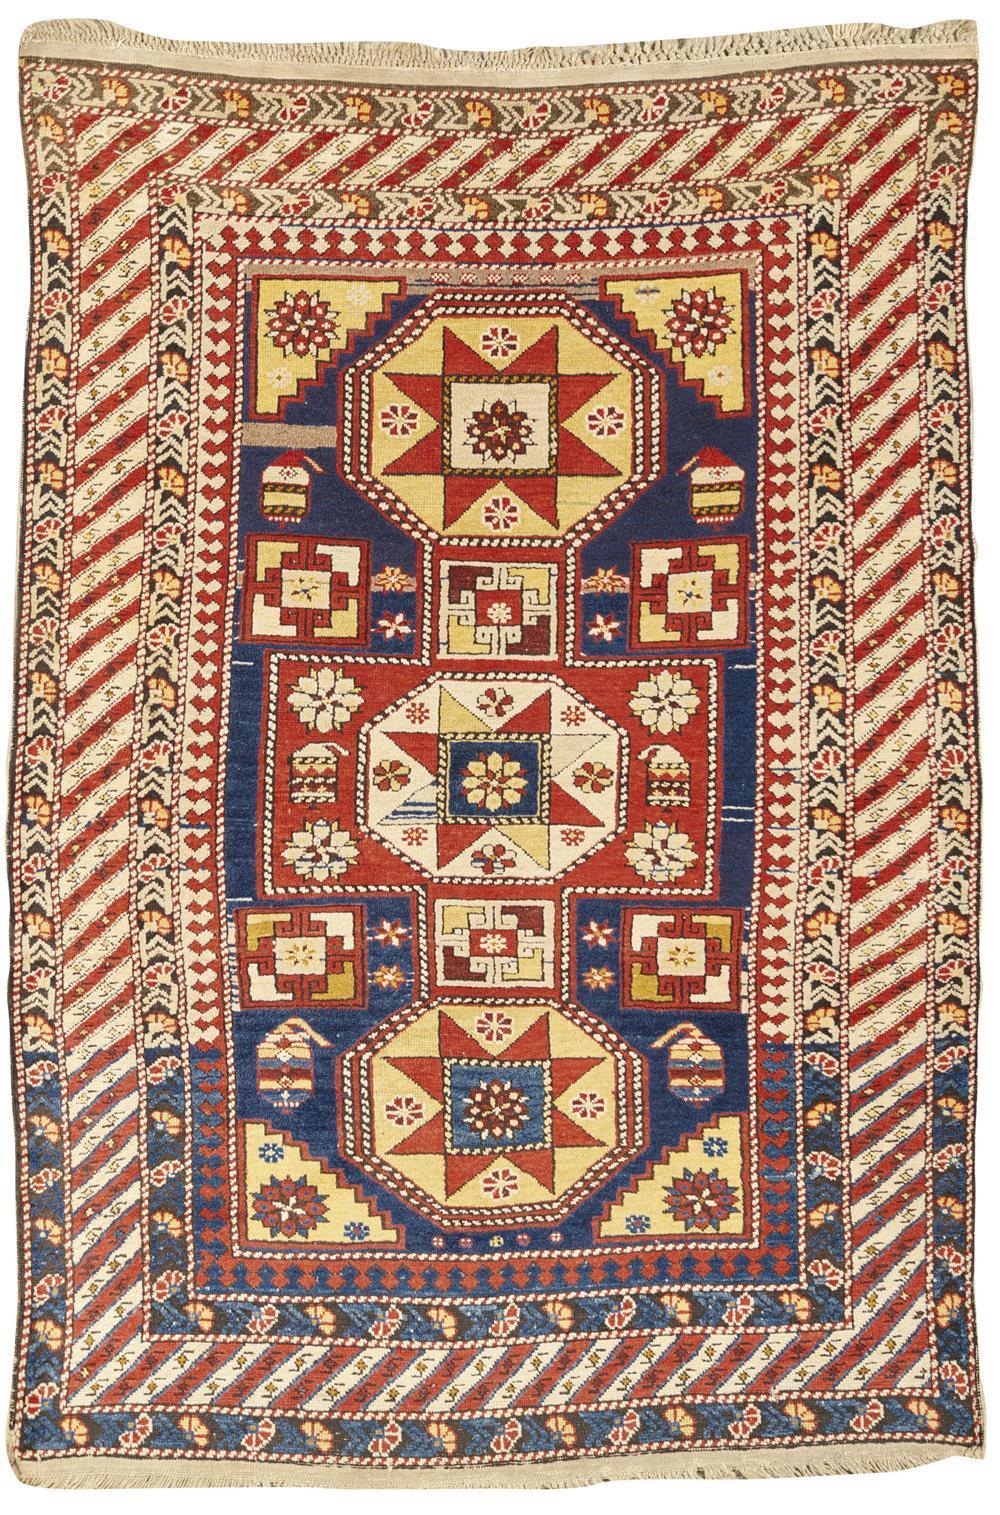 Baku Chila Rug, Caucasus, ca. 1900; 5 ft. 7 in. x 3 ft. 9 in.